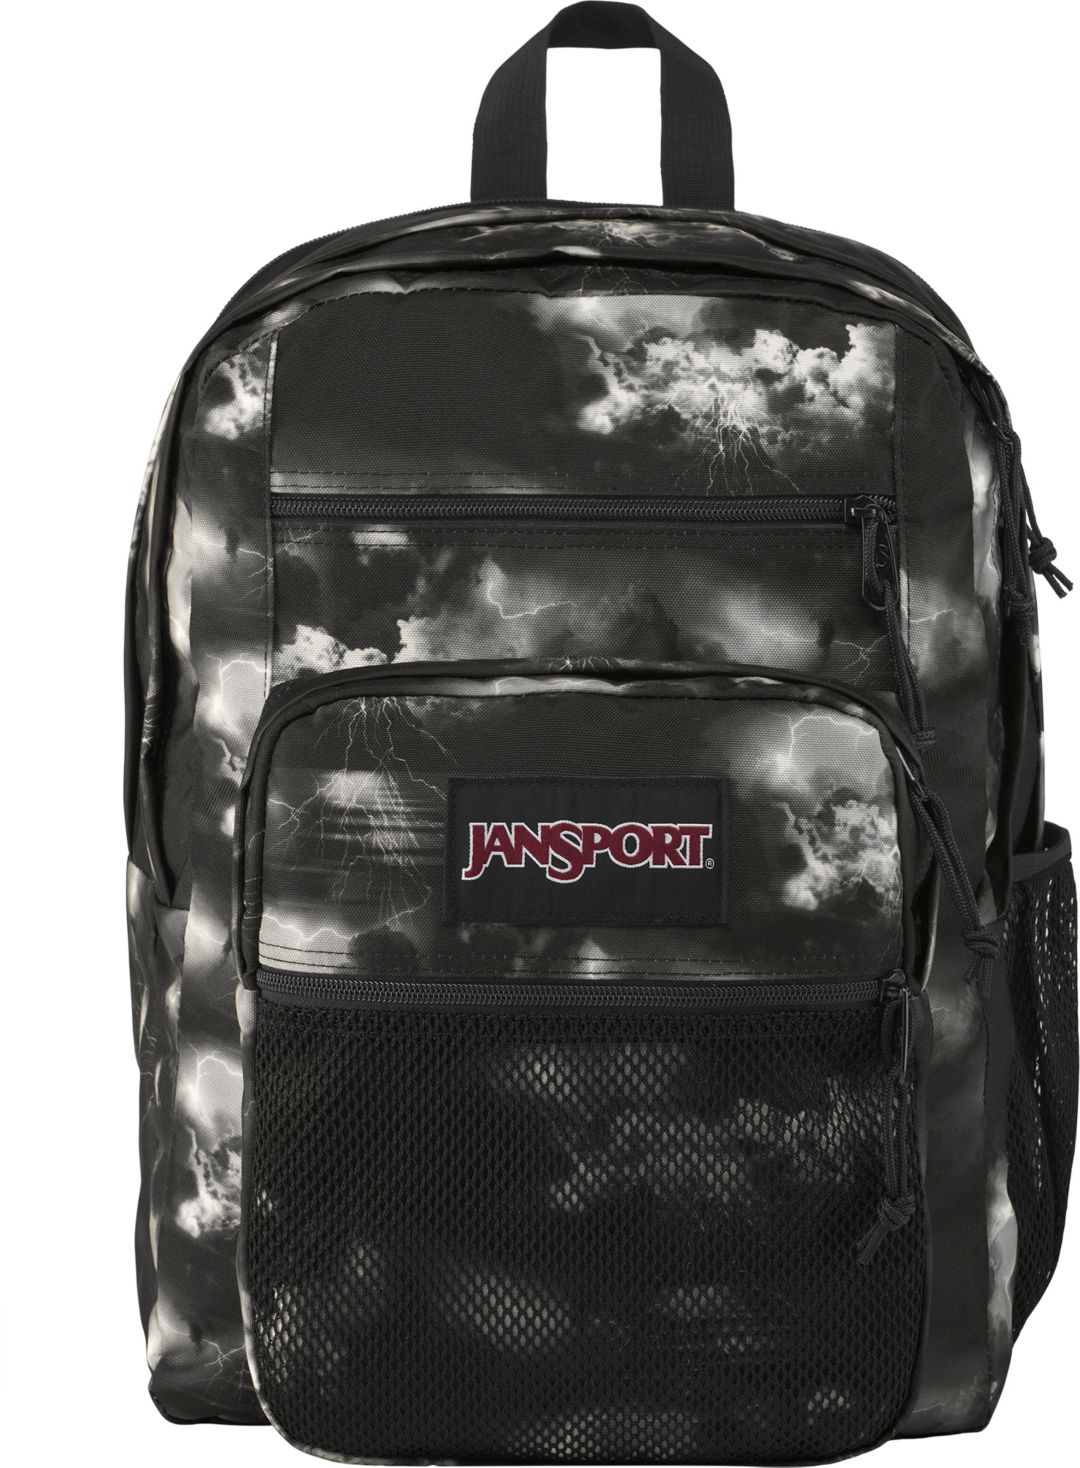 dbf6089b242 JanSport Big Campus Backpack